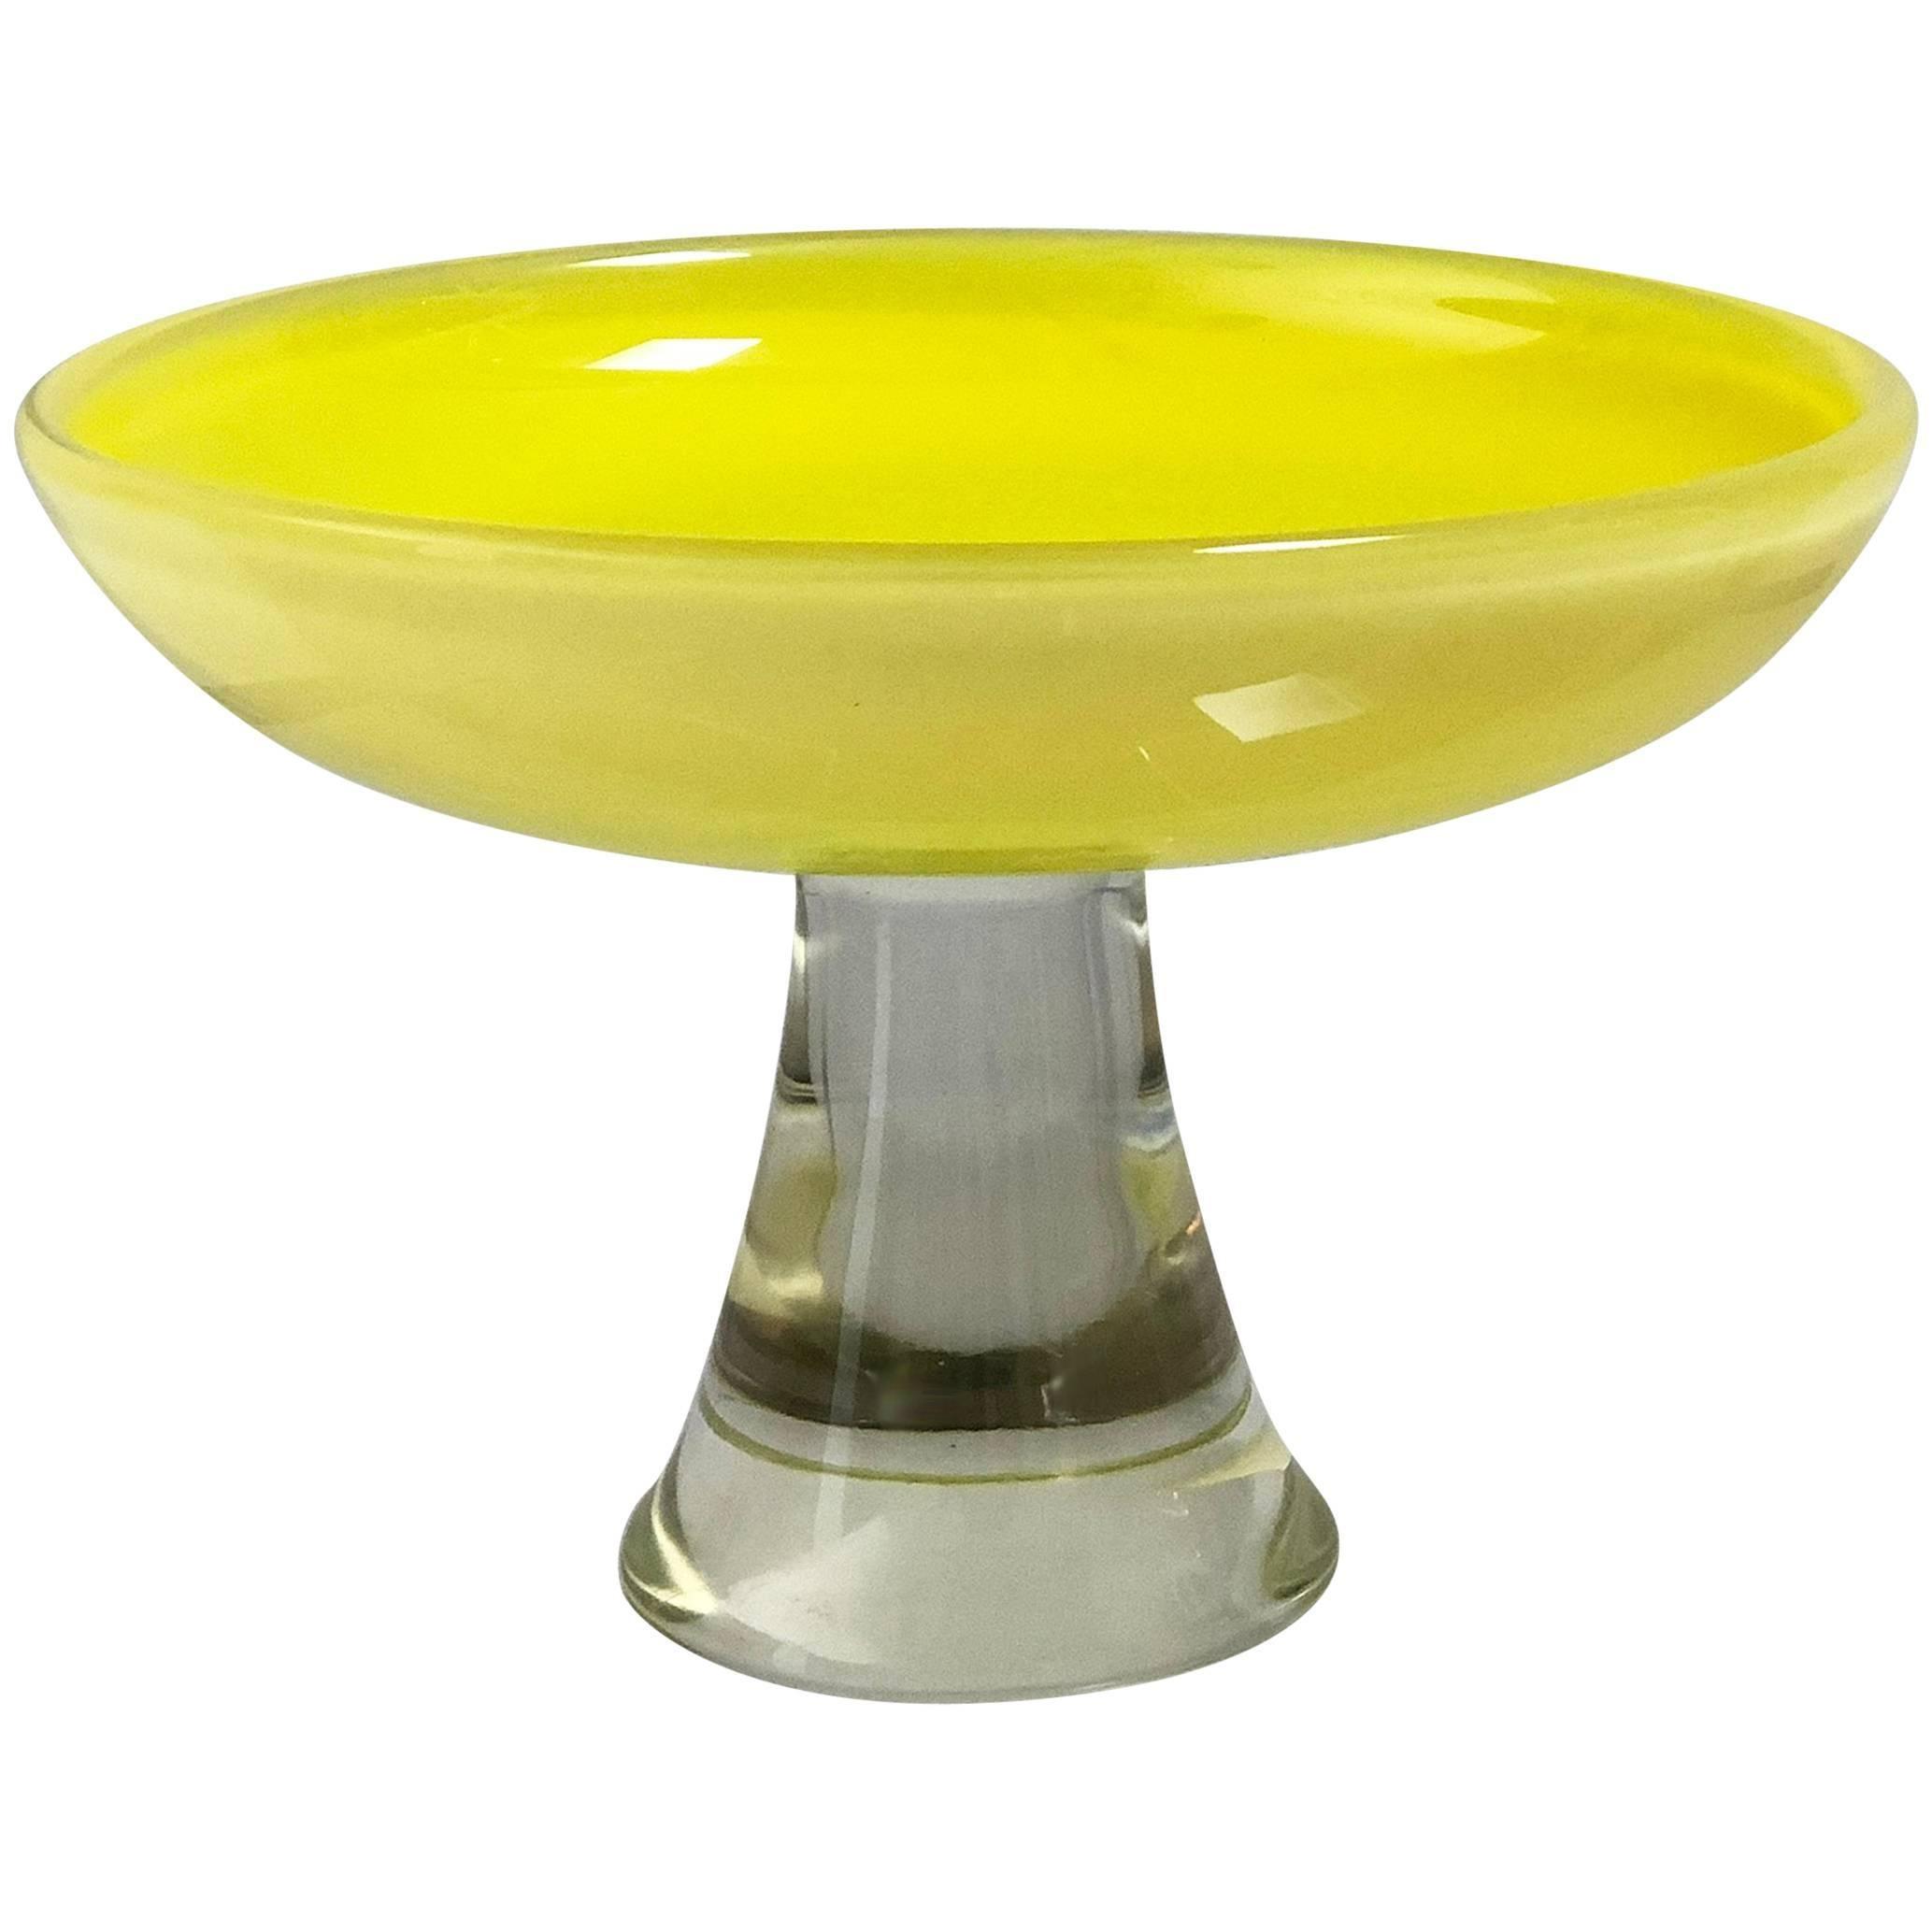 Murano Glass Decorative Serving Dish